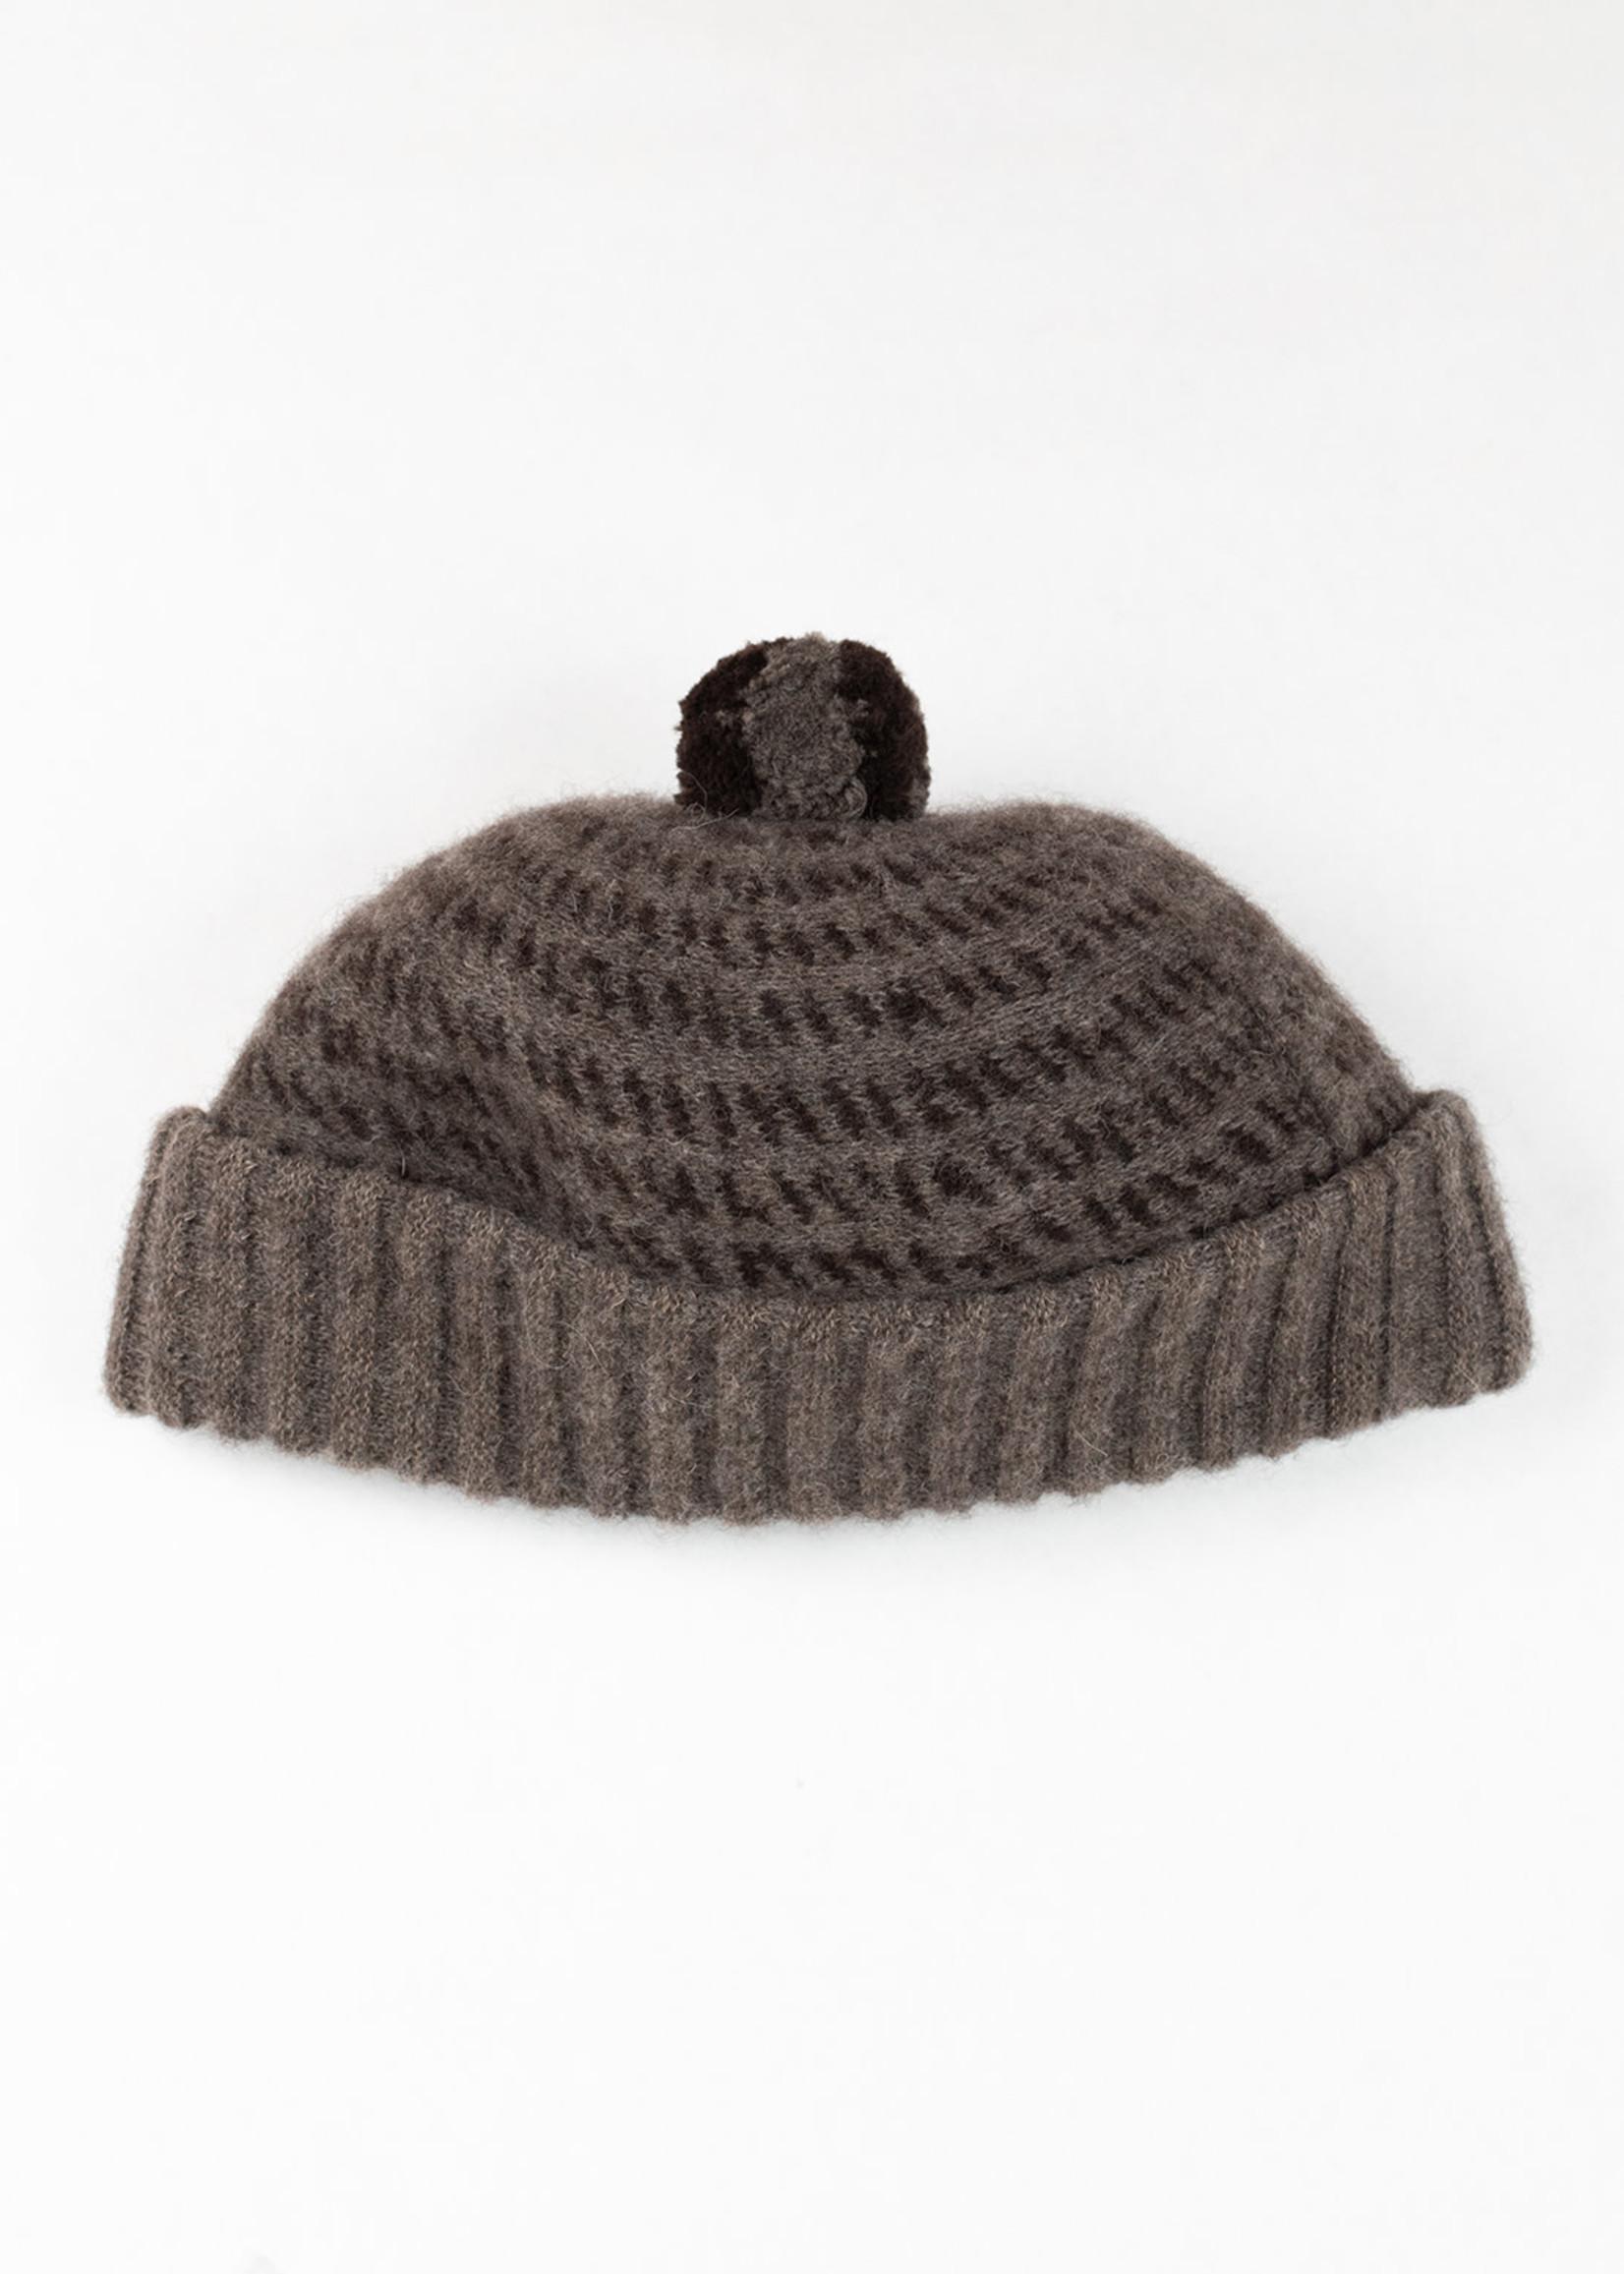 Kokeshi Alpaca/Wool Knit Bobble Cap Beige by Cableami